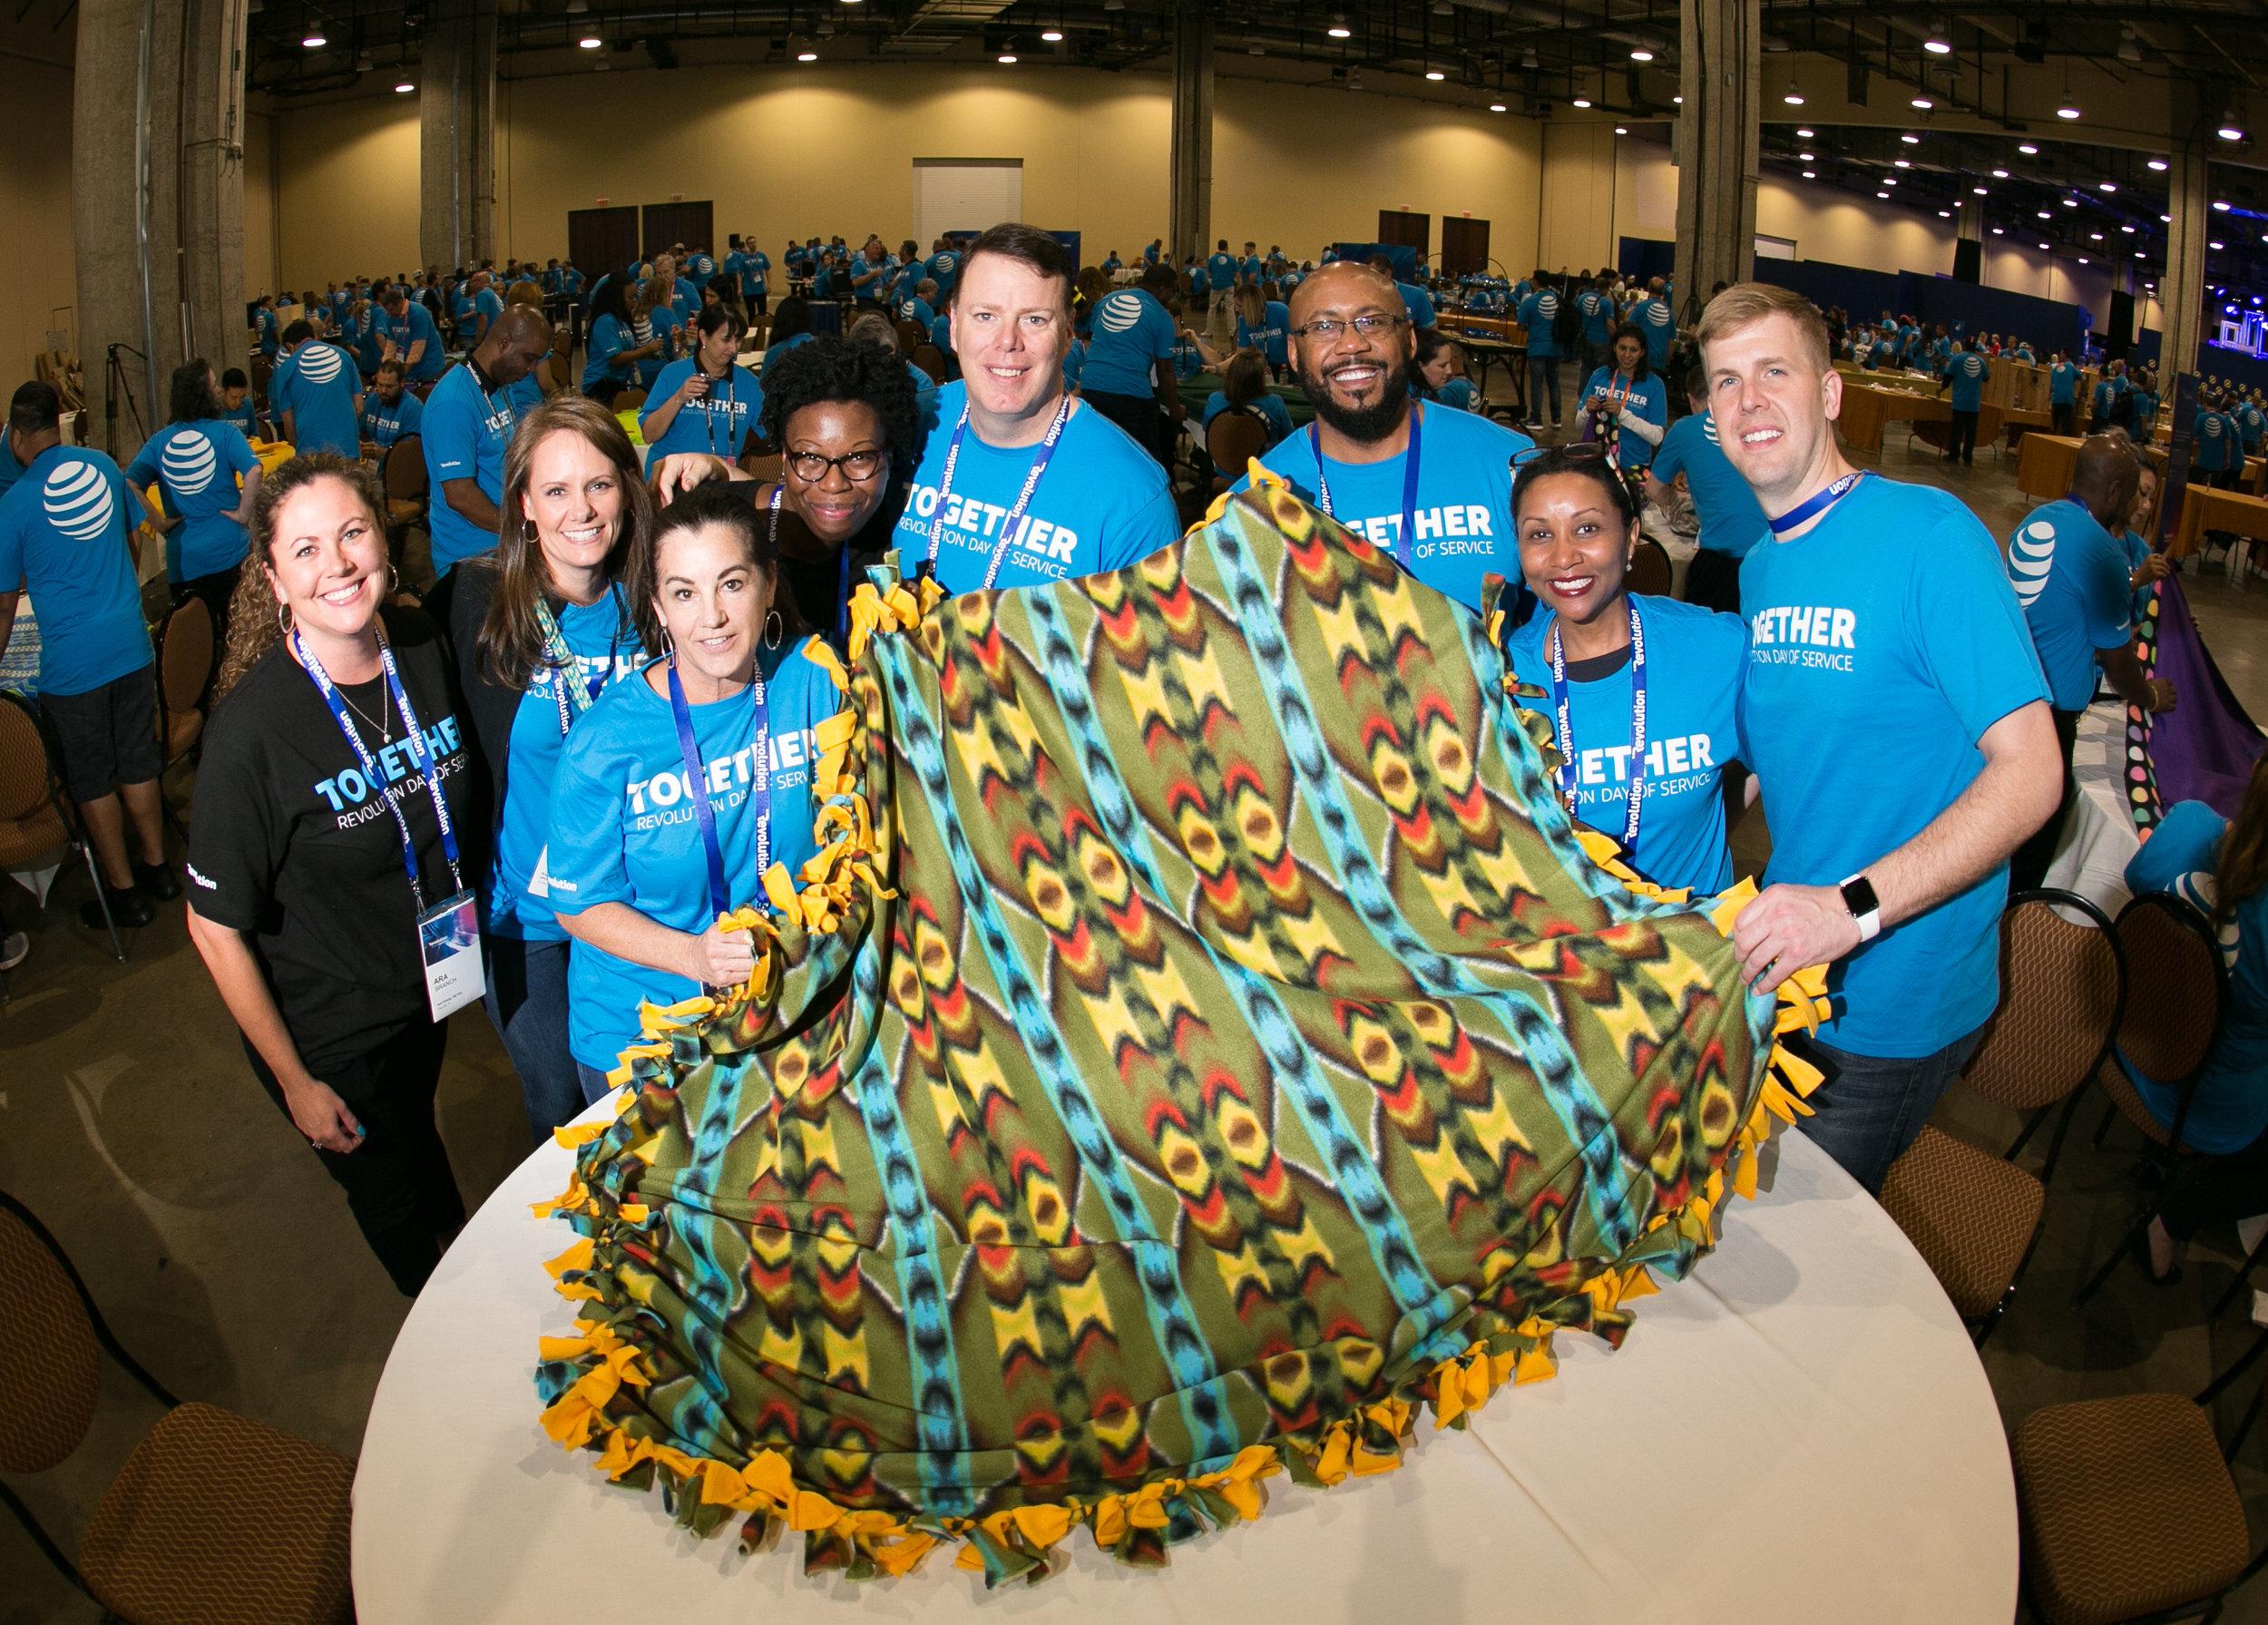 Children-Group-Showing-Blanket-ATT-Dallas-18.jpg